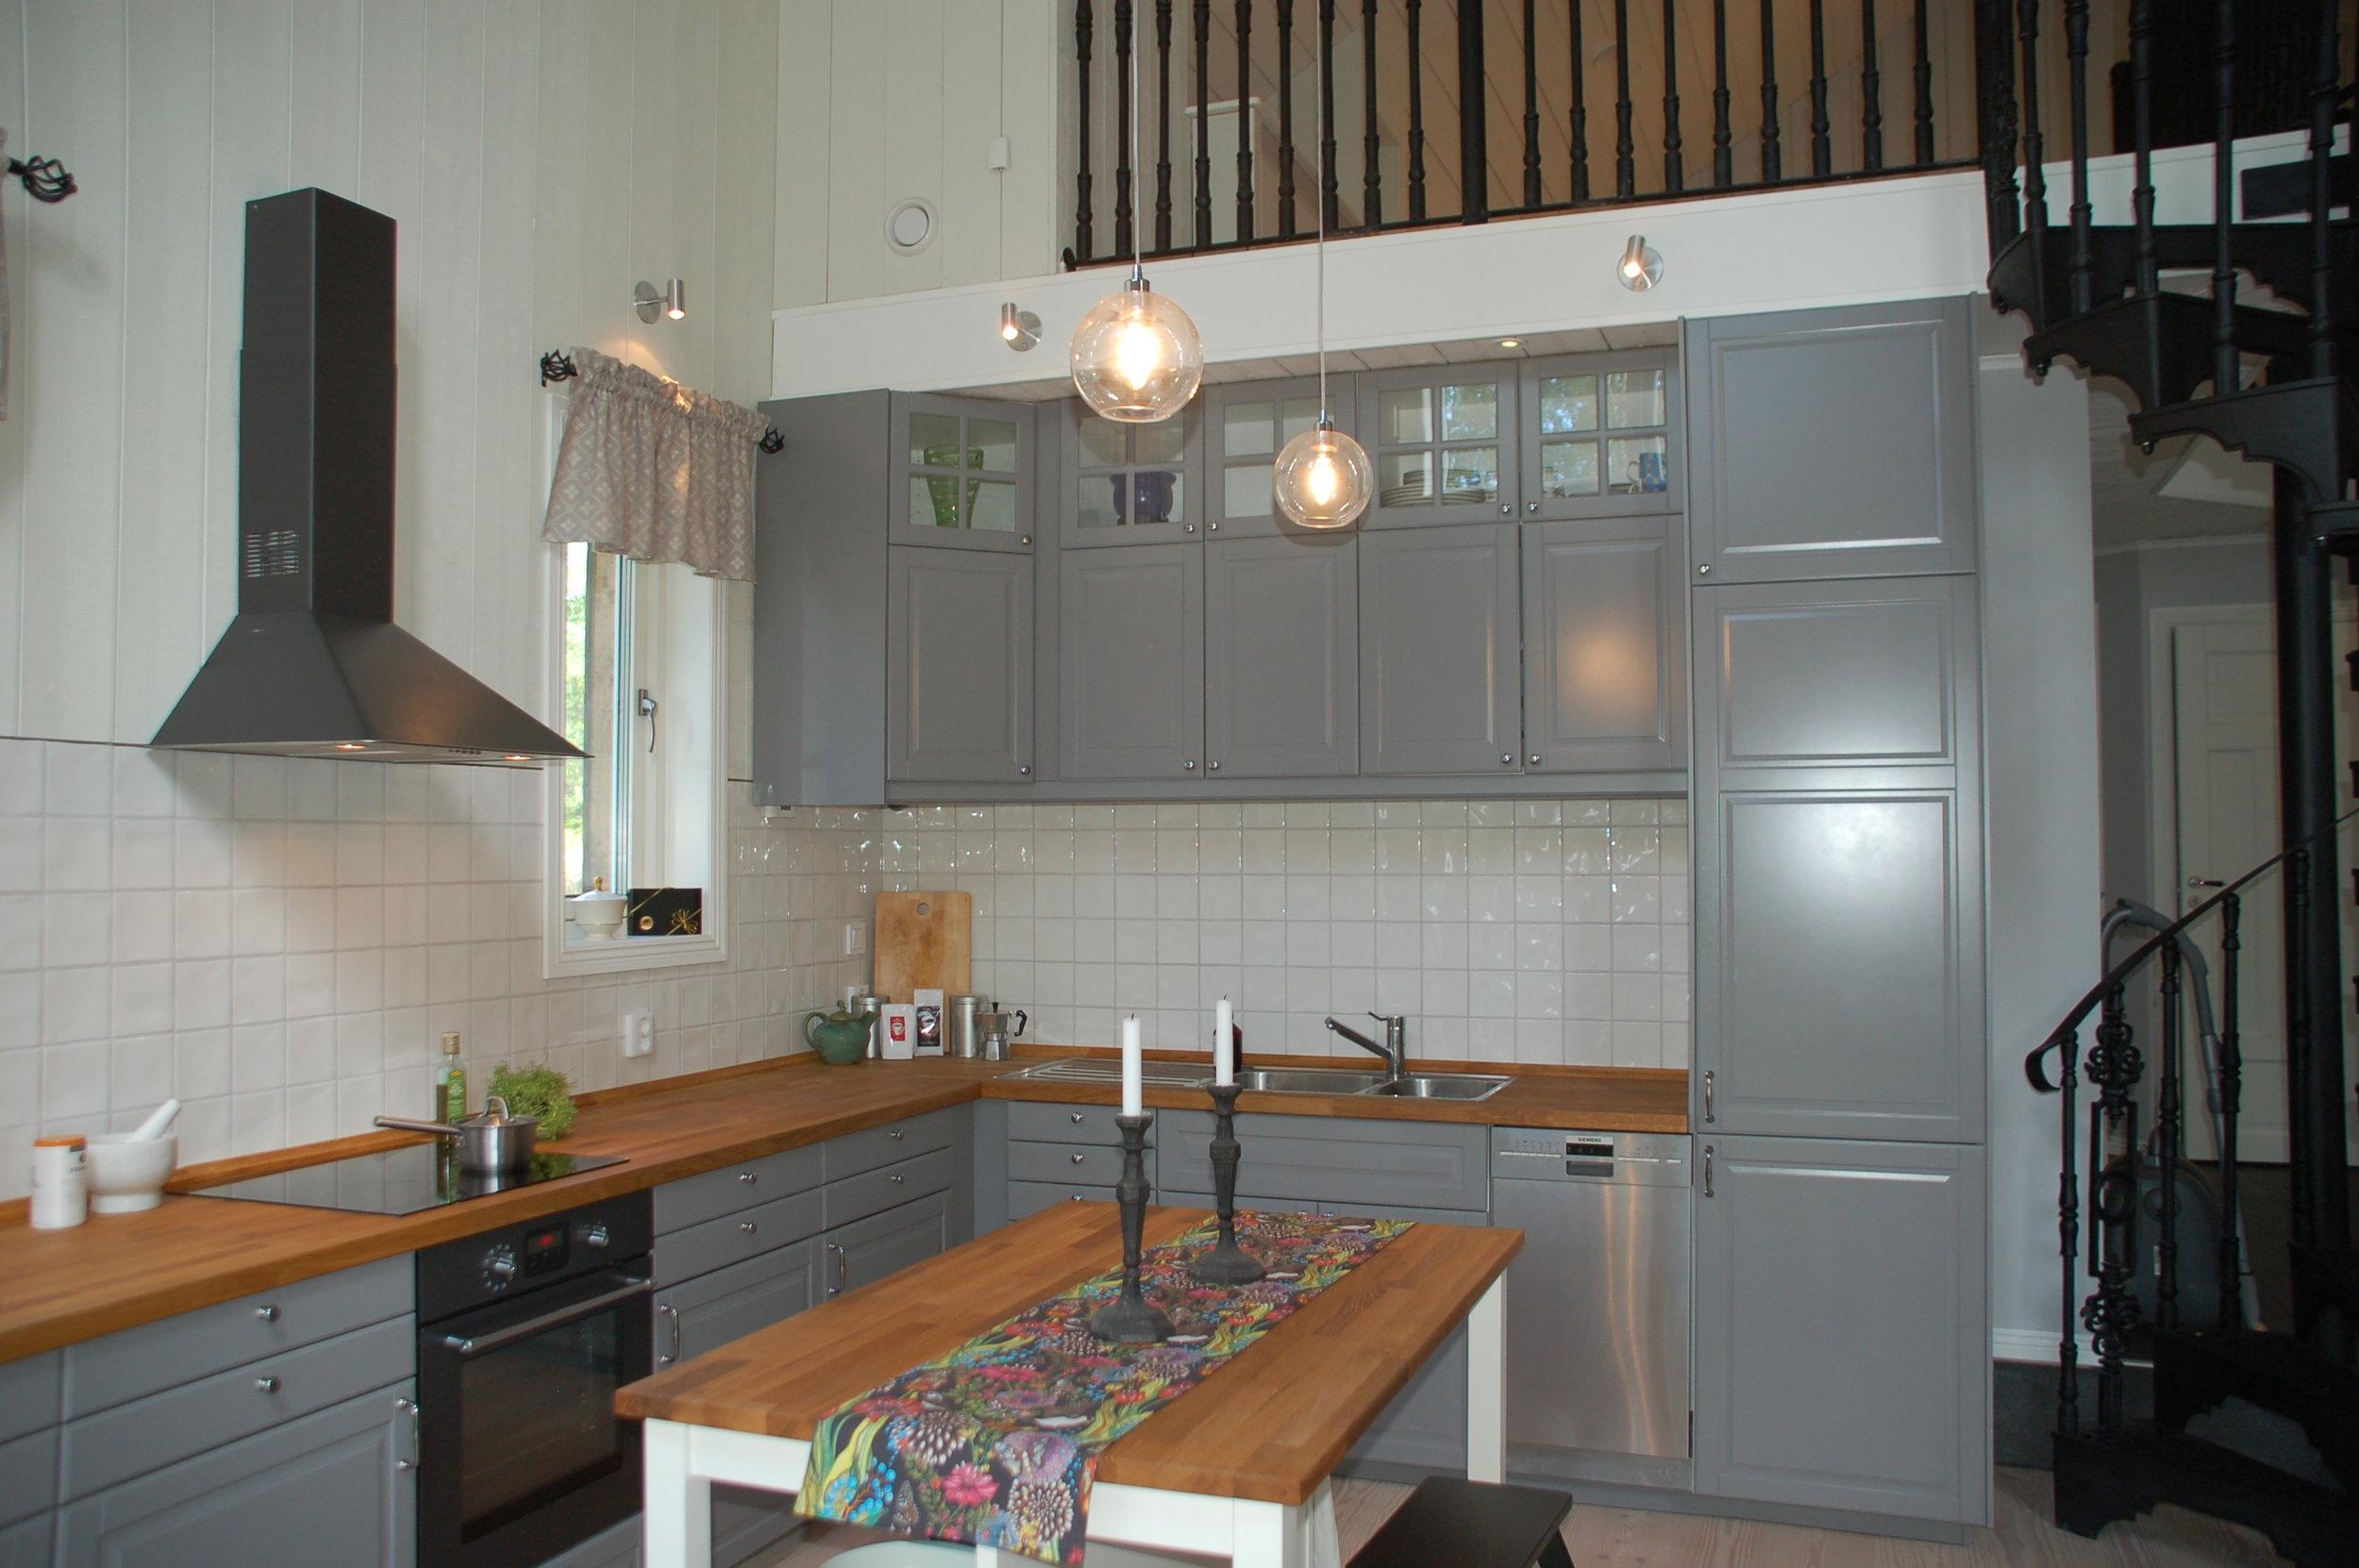 Grey IKEA kitchen with black appliances.